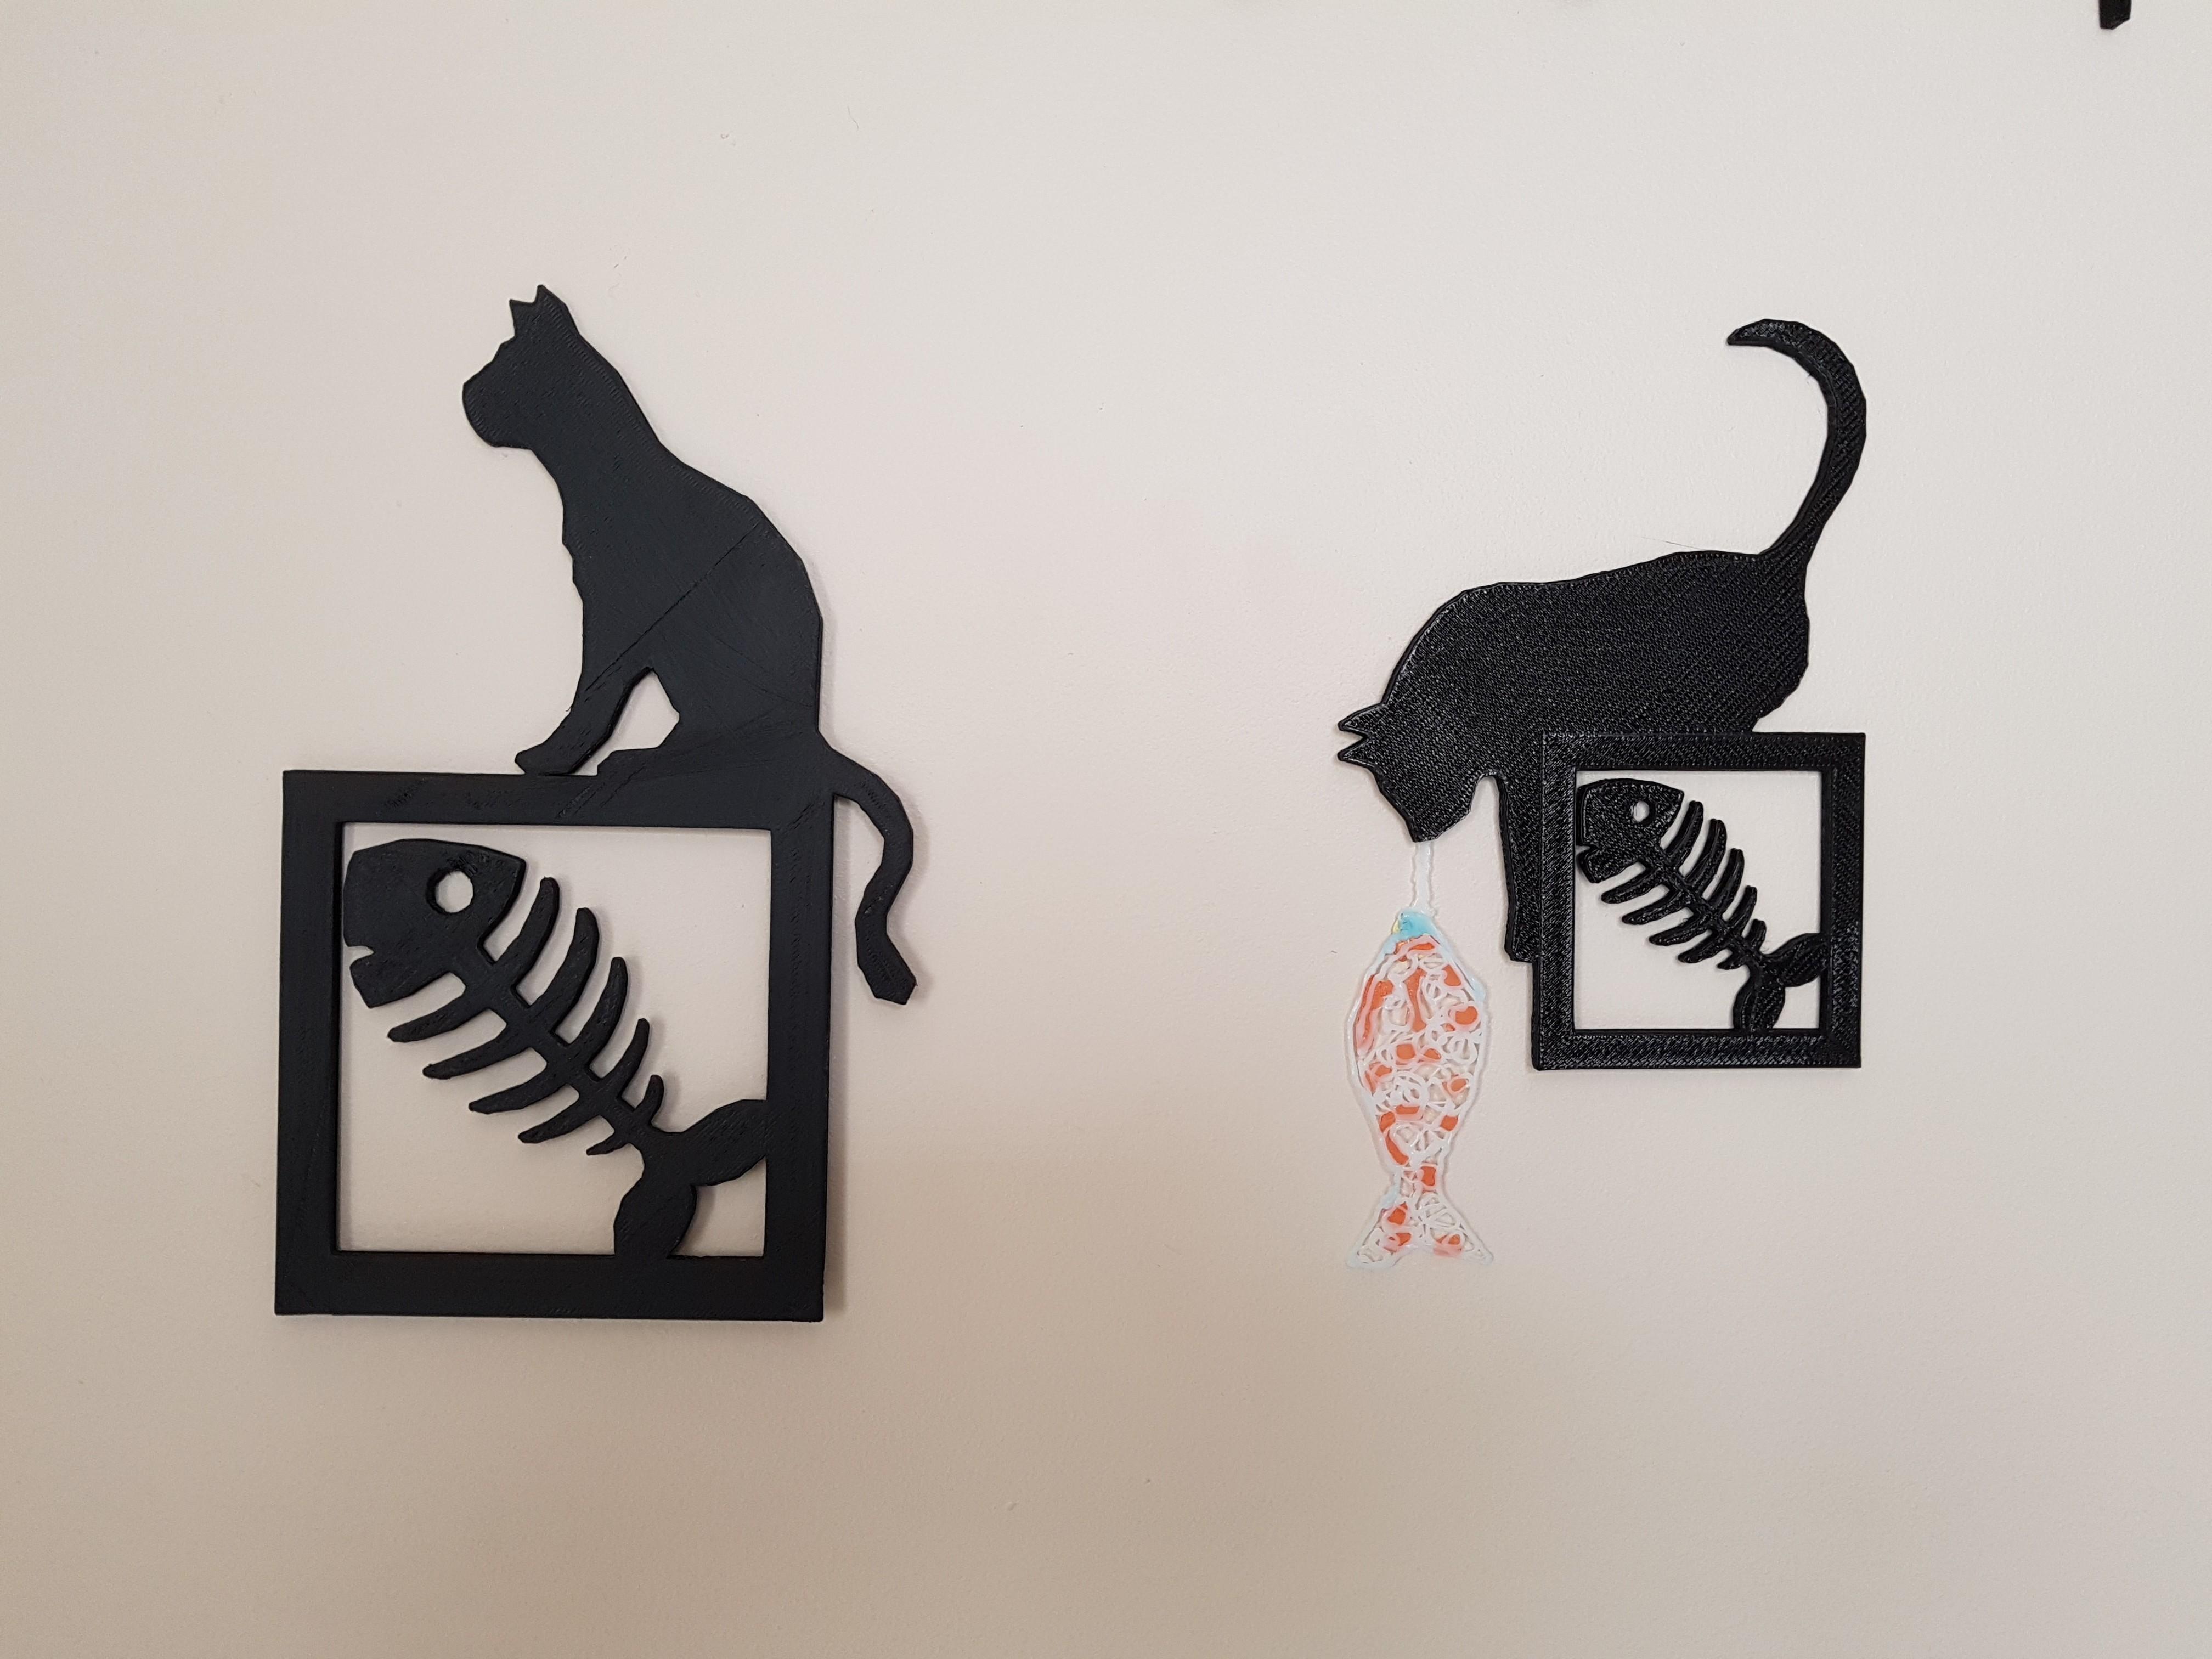 20180606_115004.jpg Download STL file cat pictures • 3D printable model, catf3d